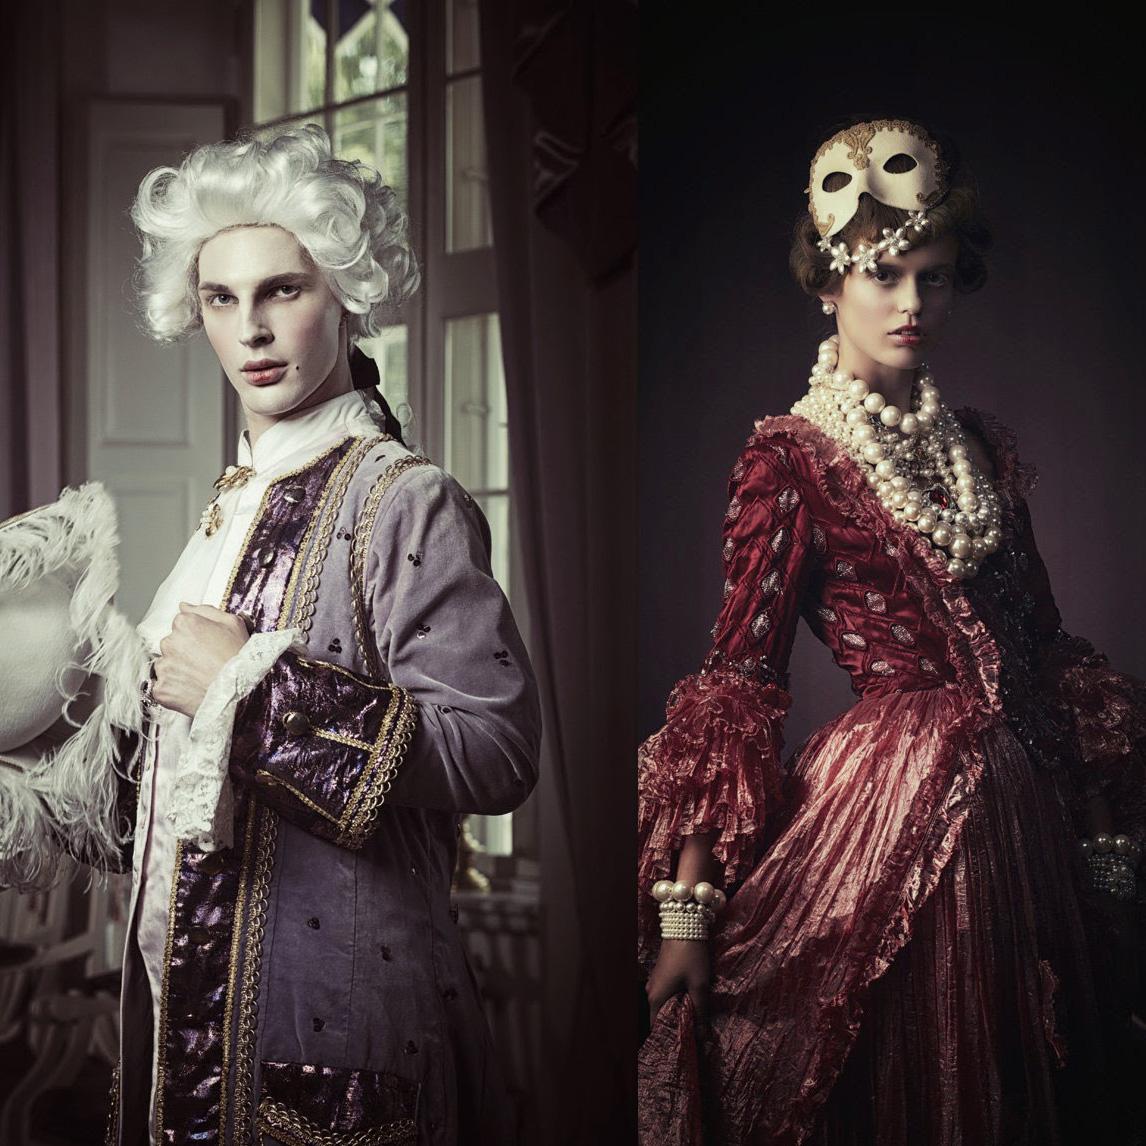 Estonia's Next Top Model Cycle 3 8th Episode : Renaissance